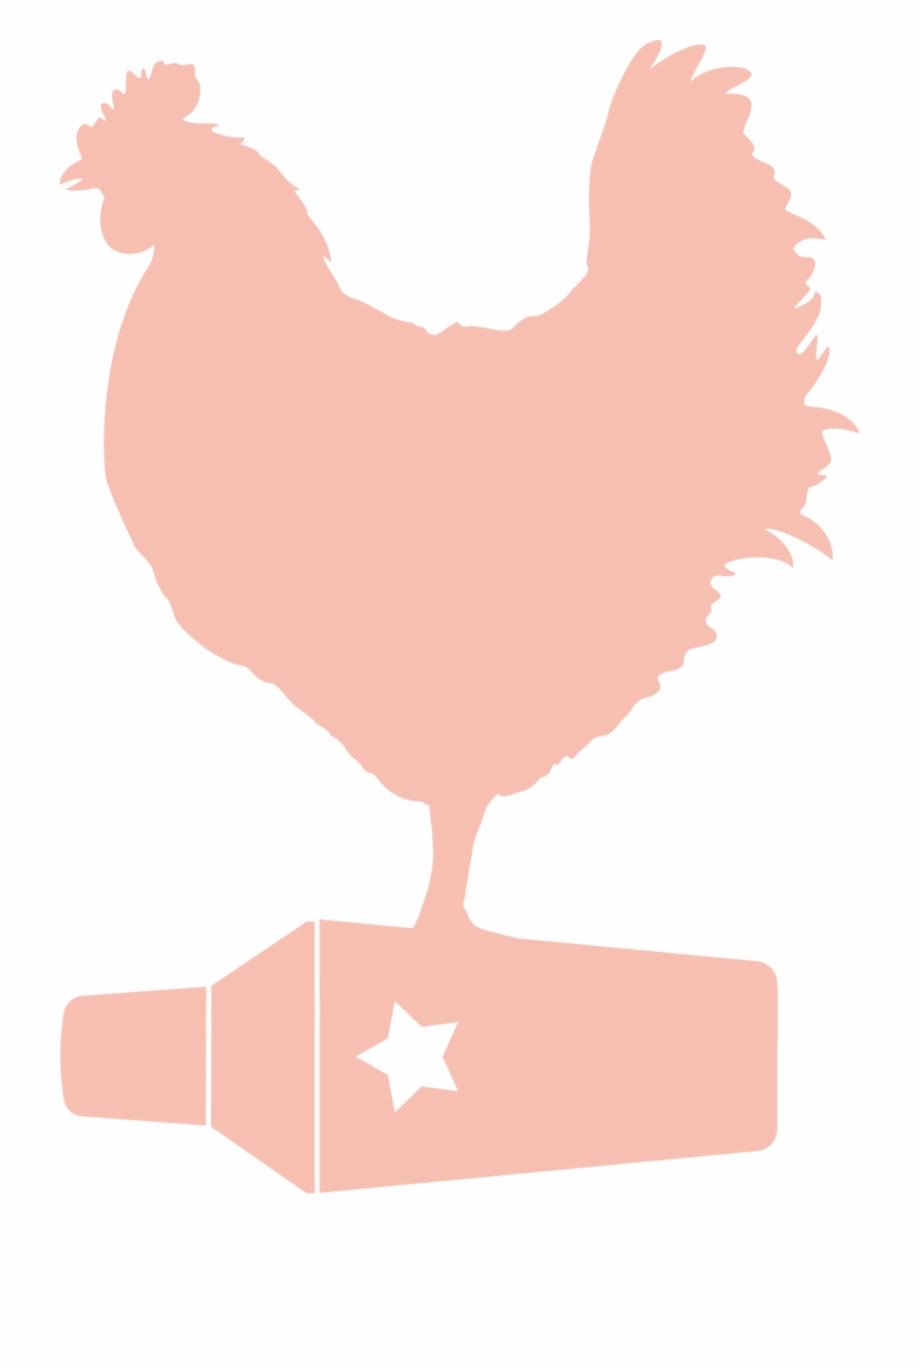 Chickens clipart orange chicken. Cocktail rooster logo